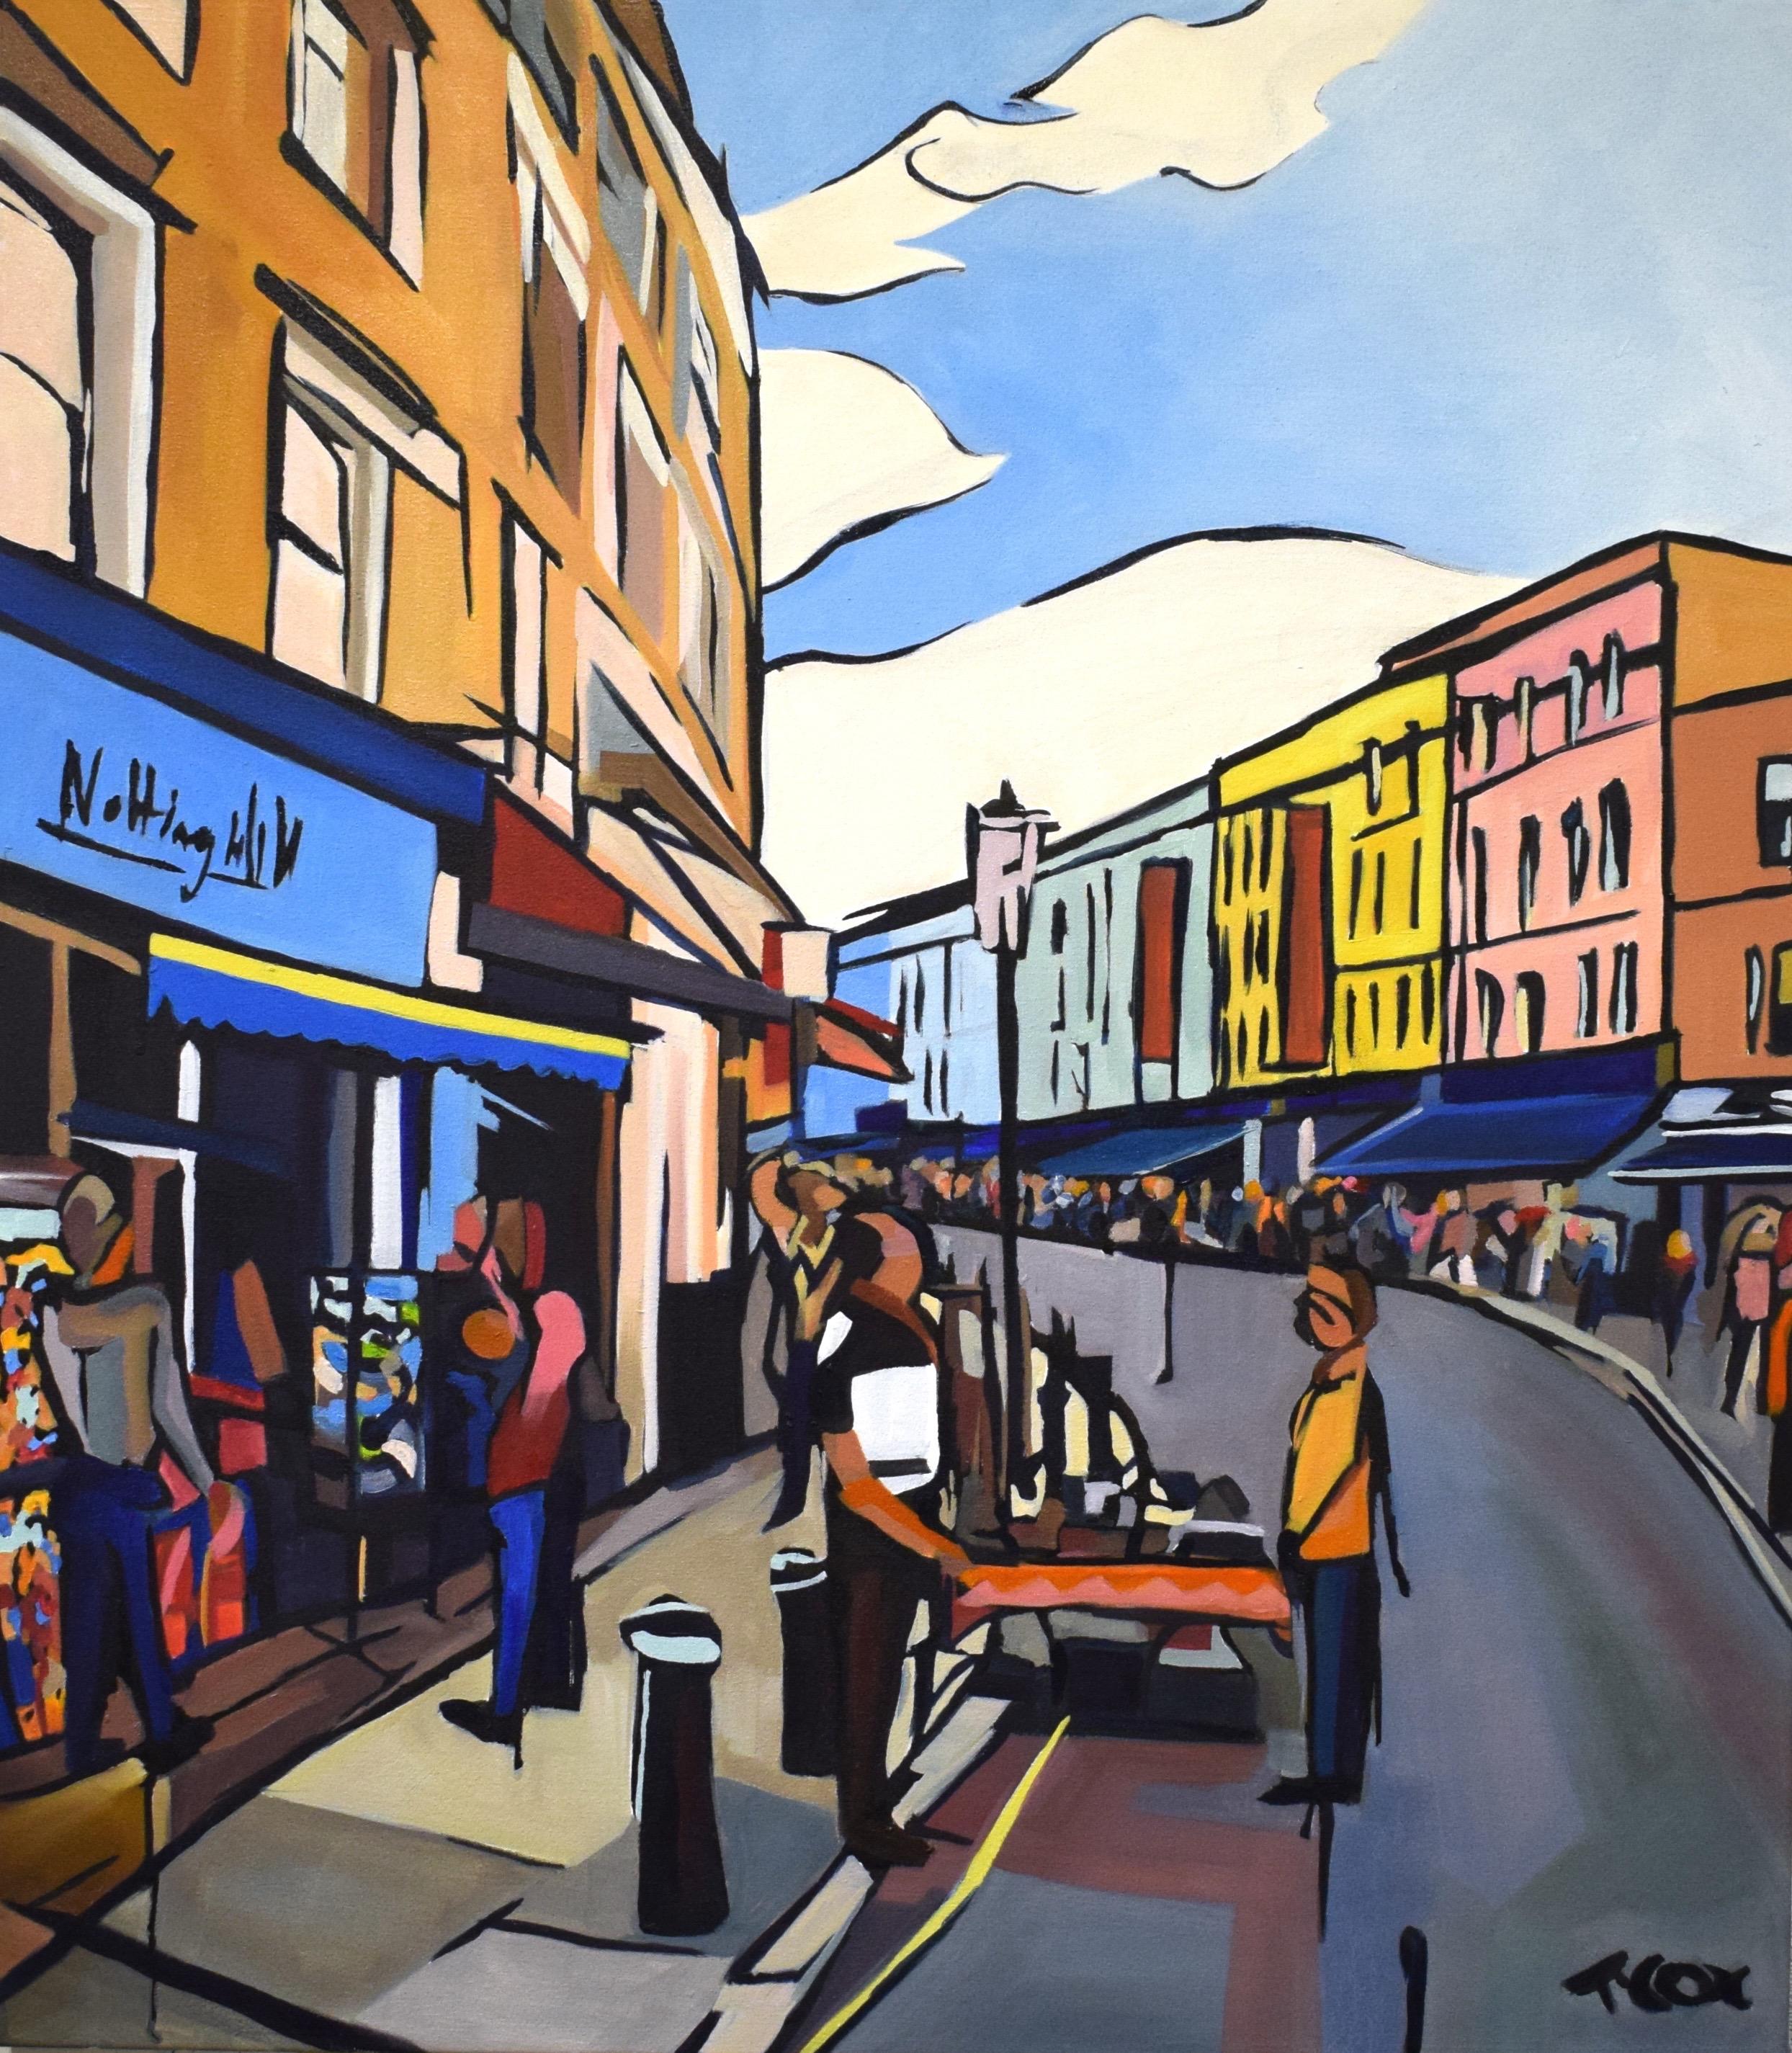 Pottering on Portobello, 2018 | Ink & oil on canvas | 70 x 80 cm | £1,250